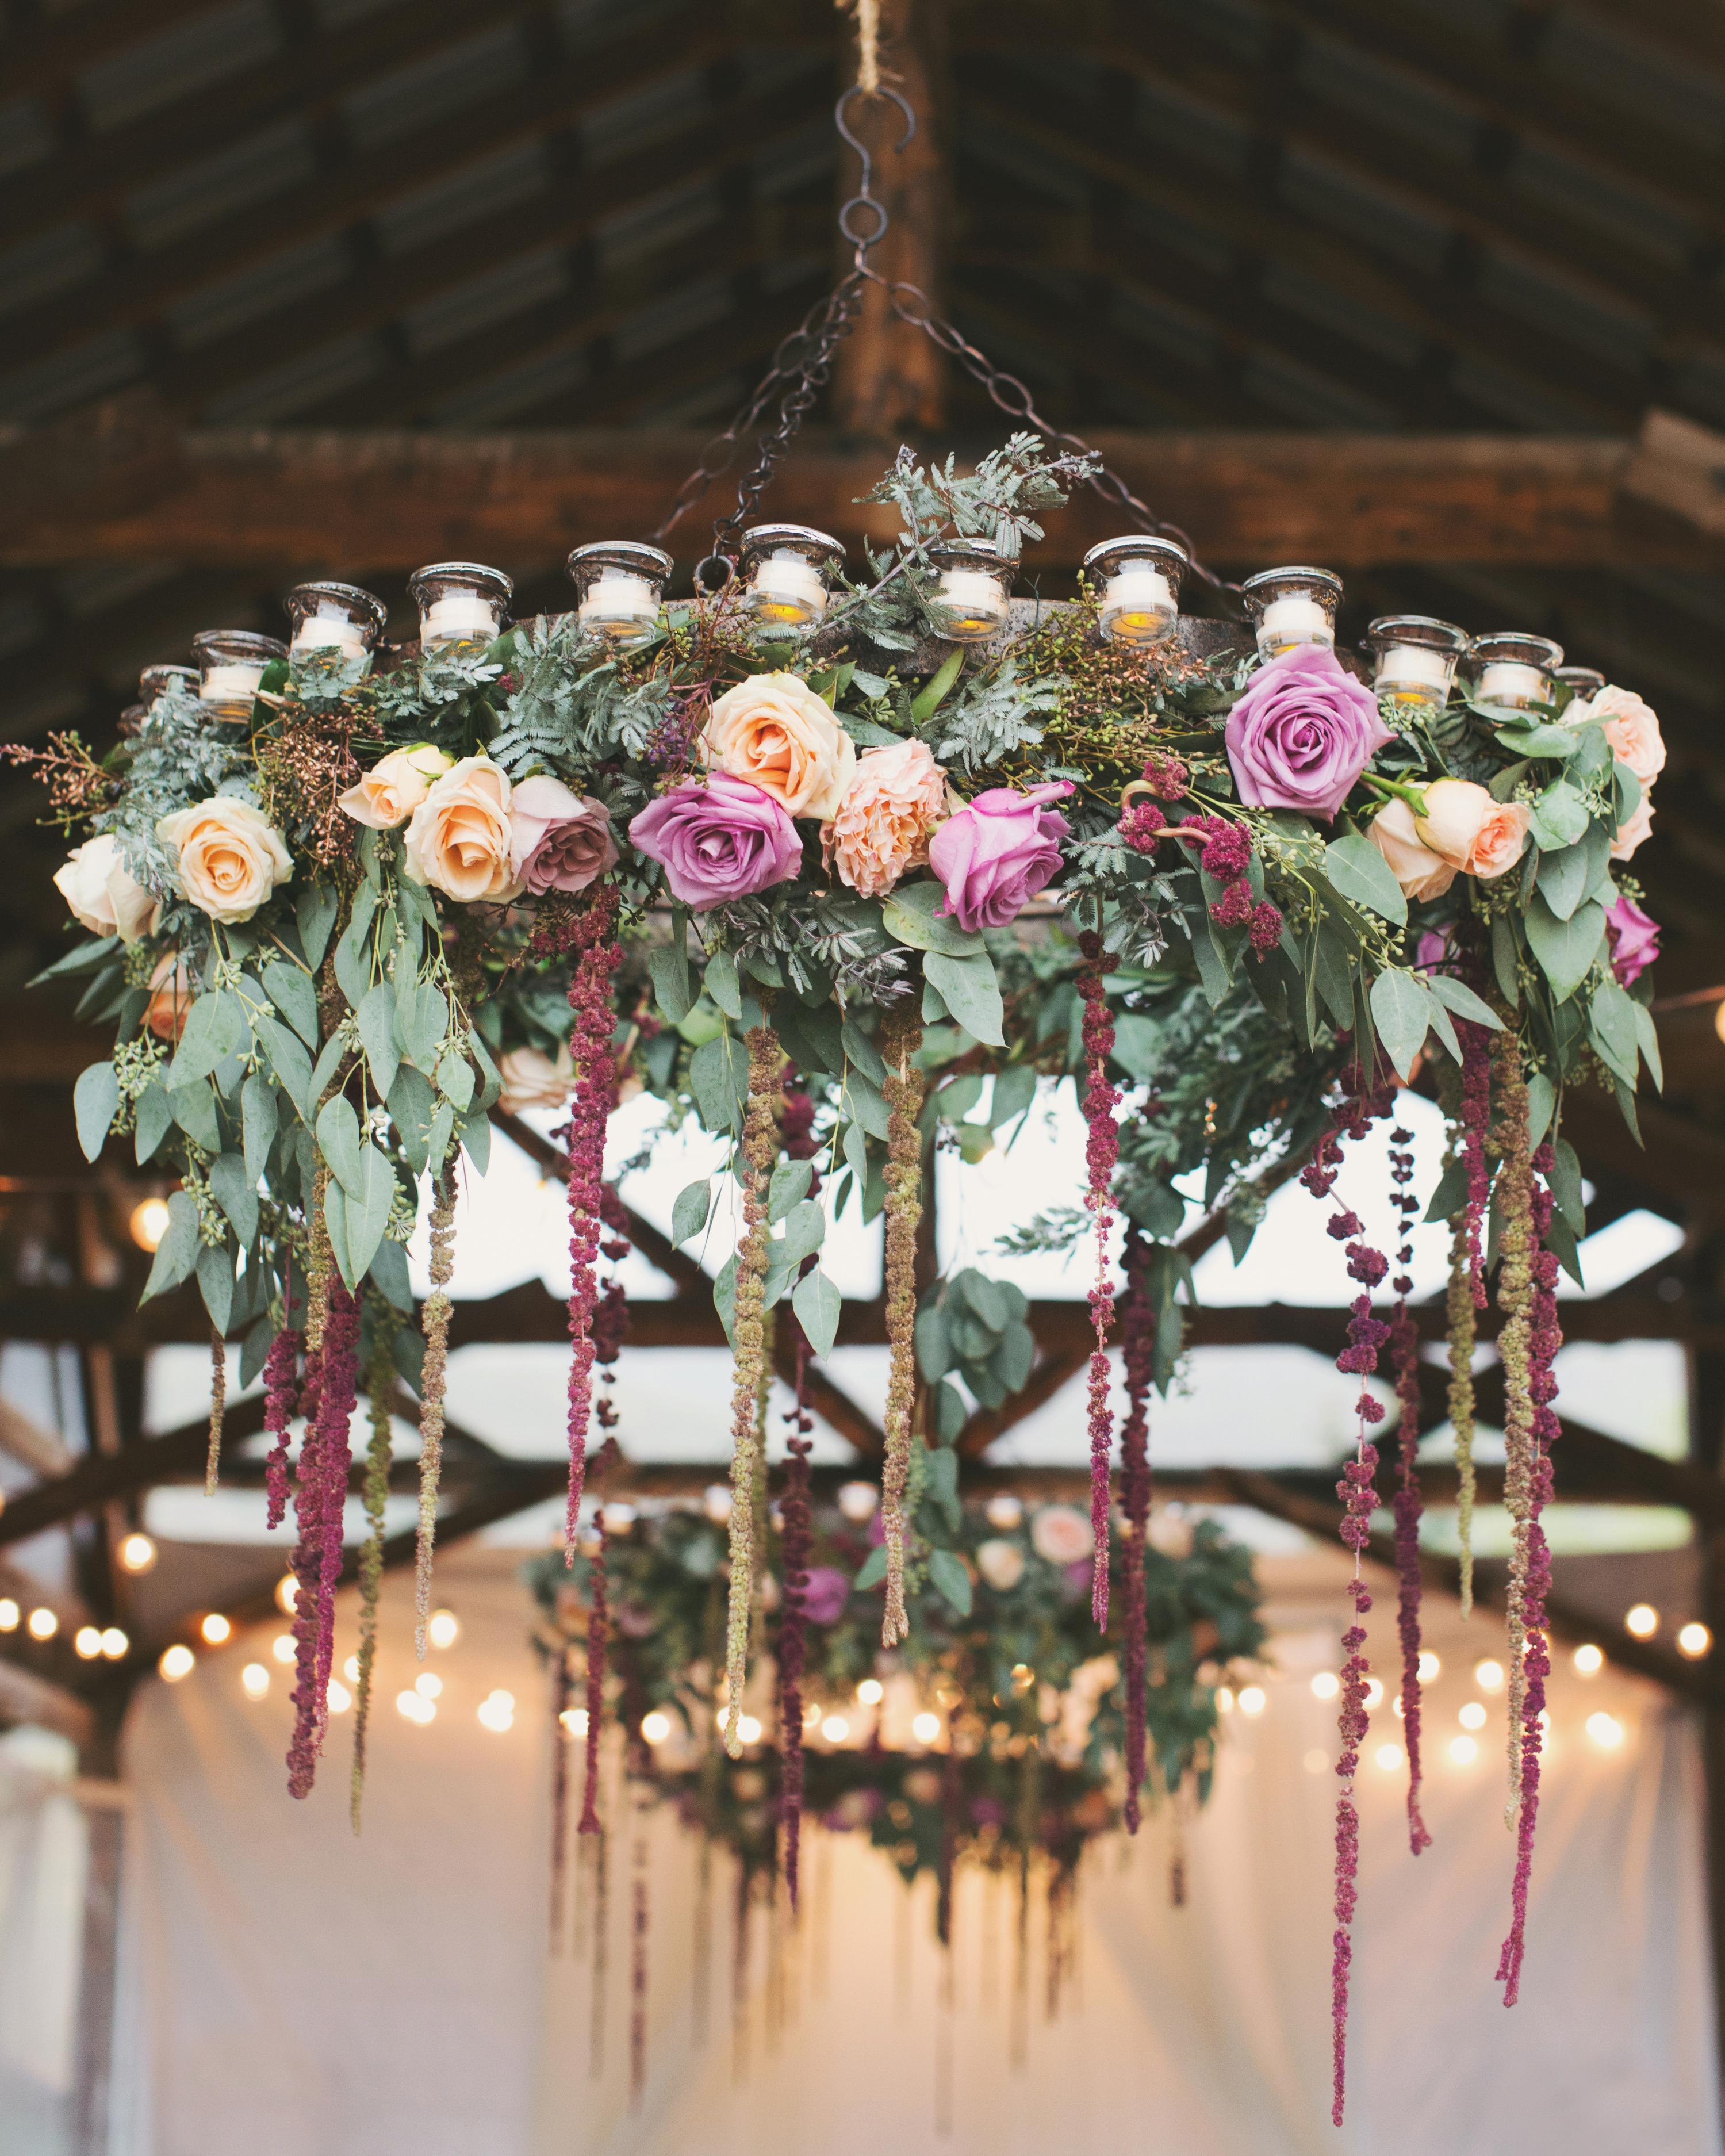 sara-matt-wedding-chandelier-1728-s111990-0715.jpg